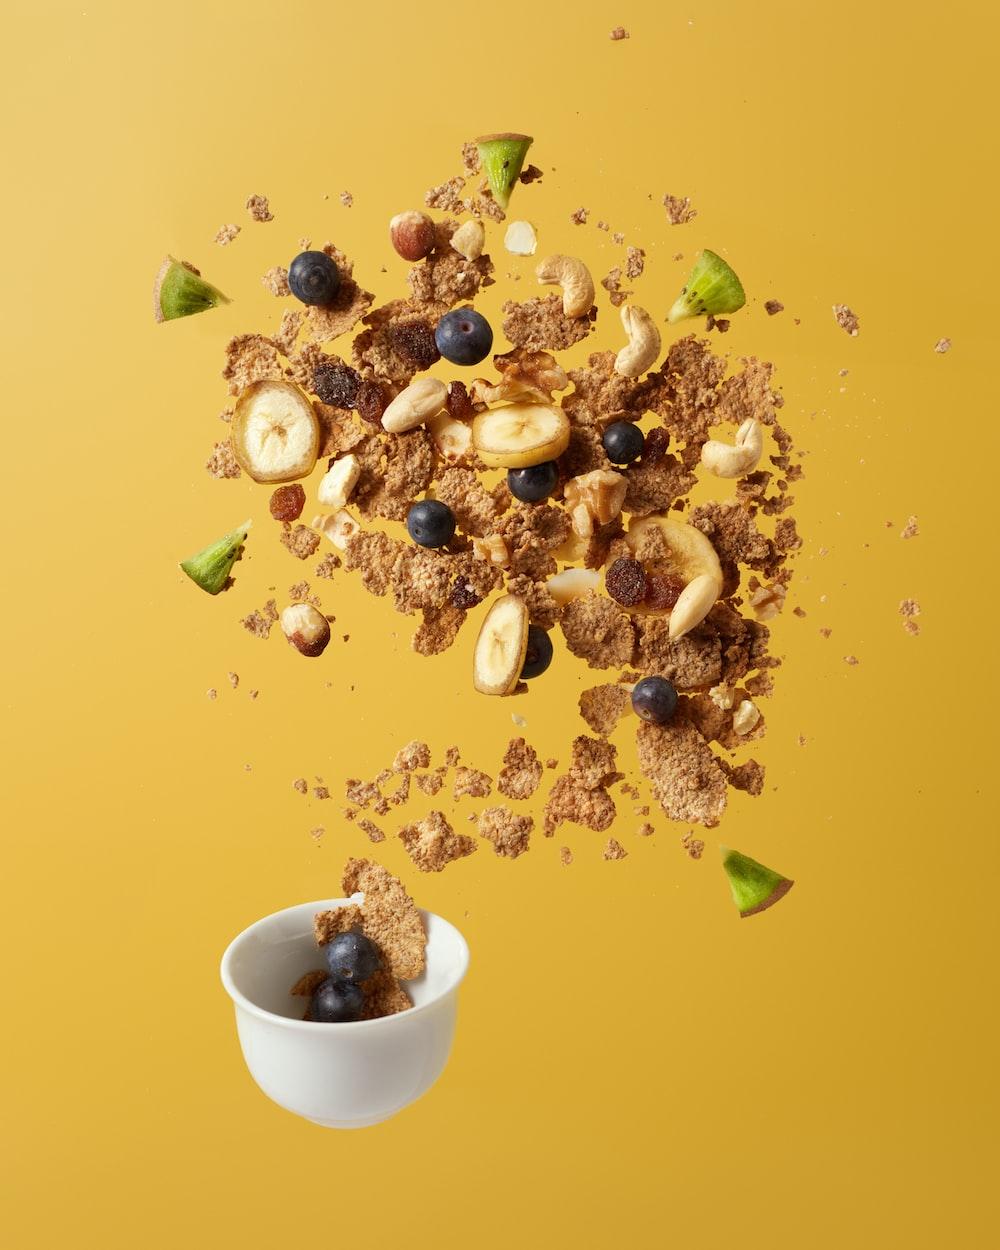 brown nuts on white ceramic bowl